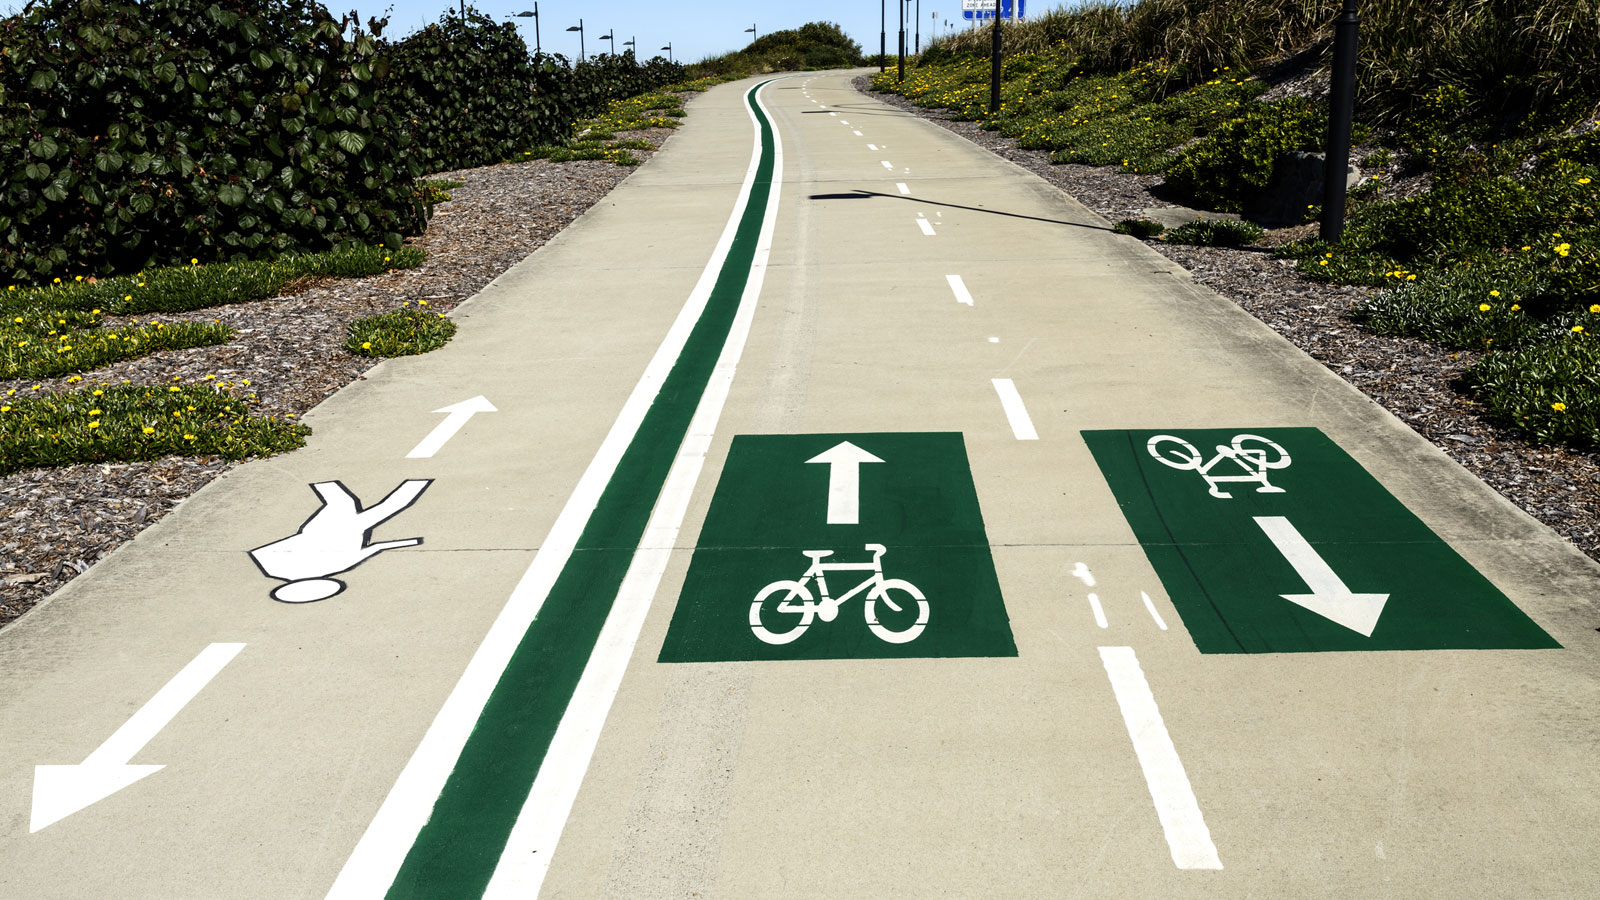 Bike and pedestrian lanes